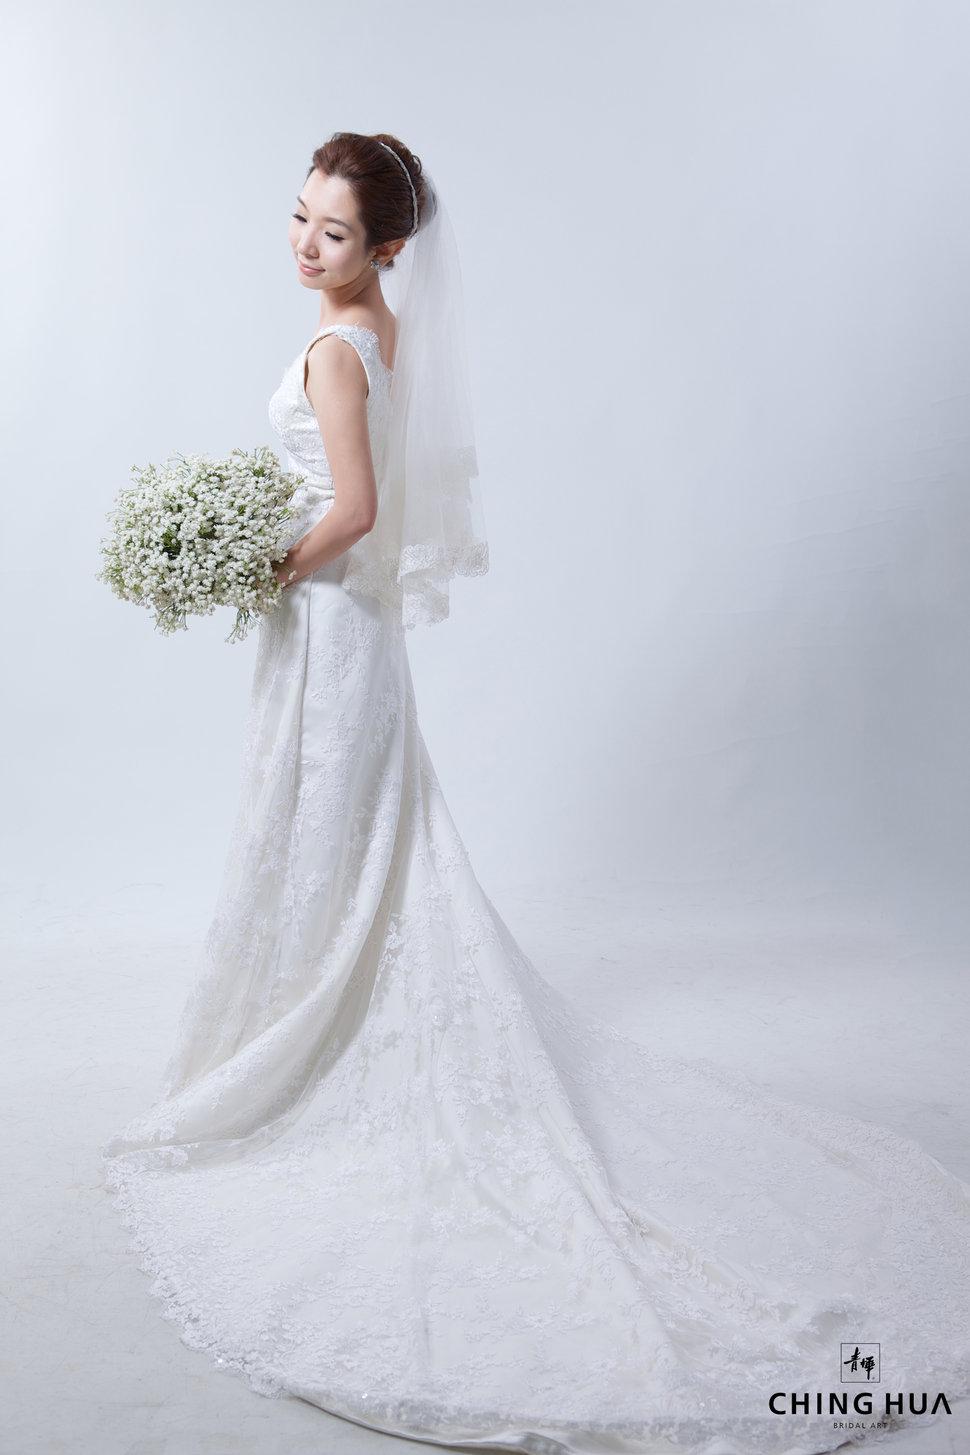 (編號:376879) - 青樺婚紗CHINGHUA - 結婚吧